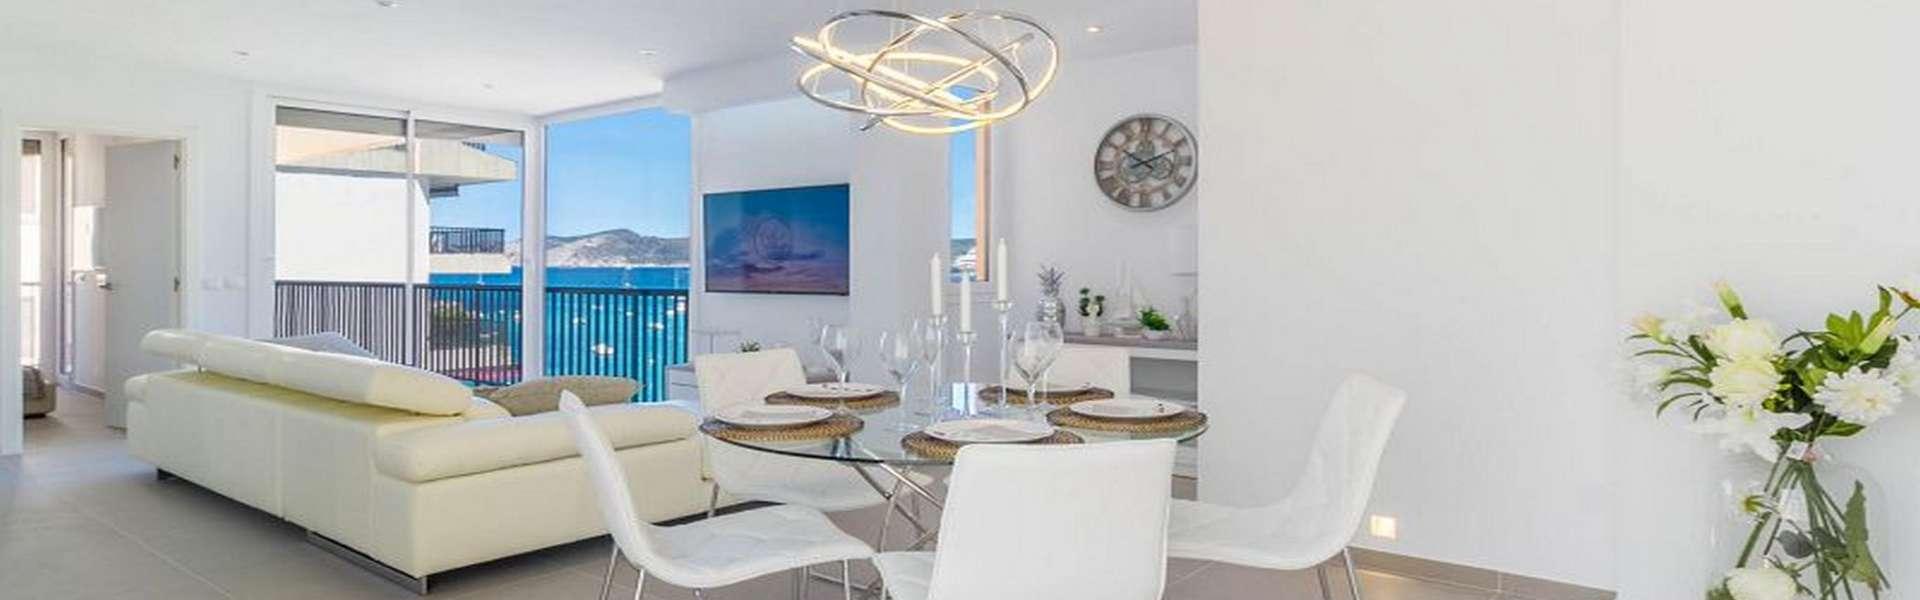 Santa Ponsa - Design-Apartment am Meer